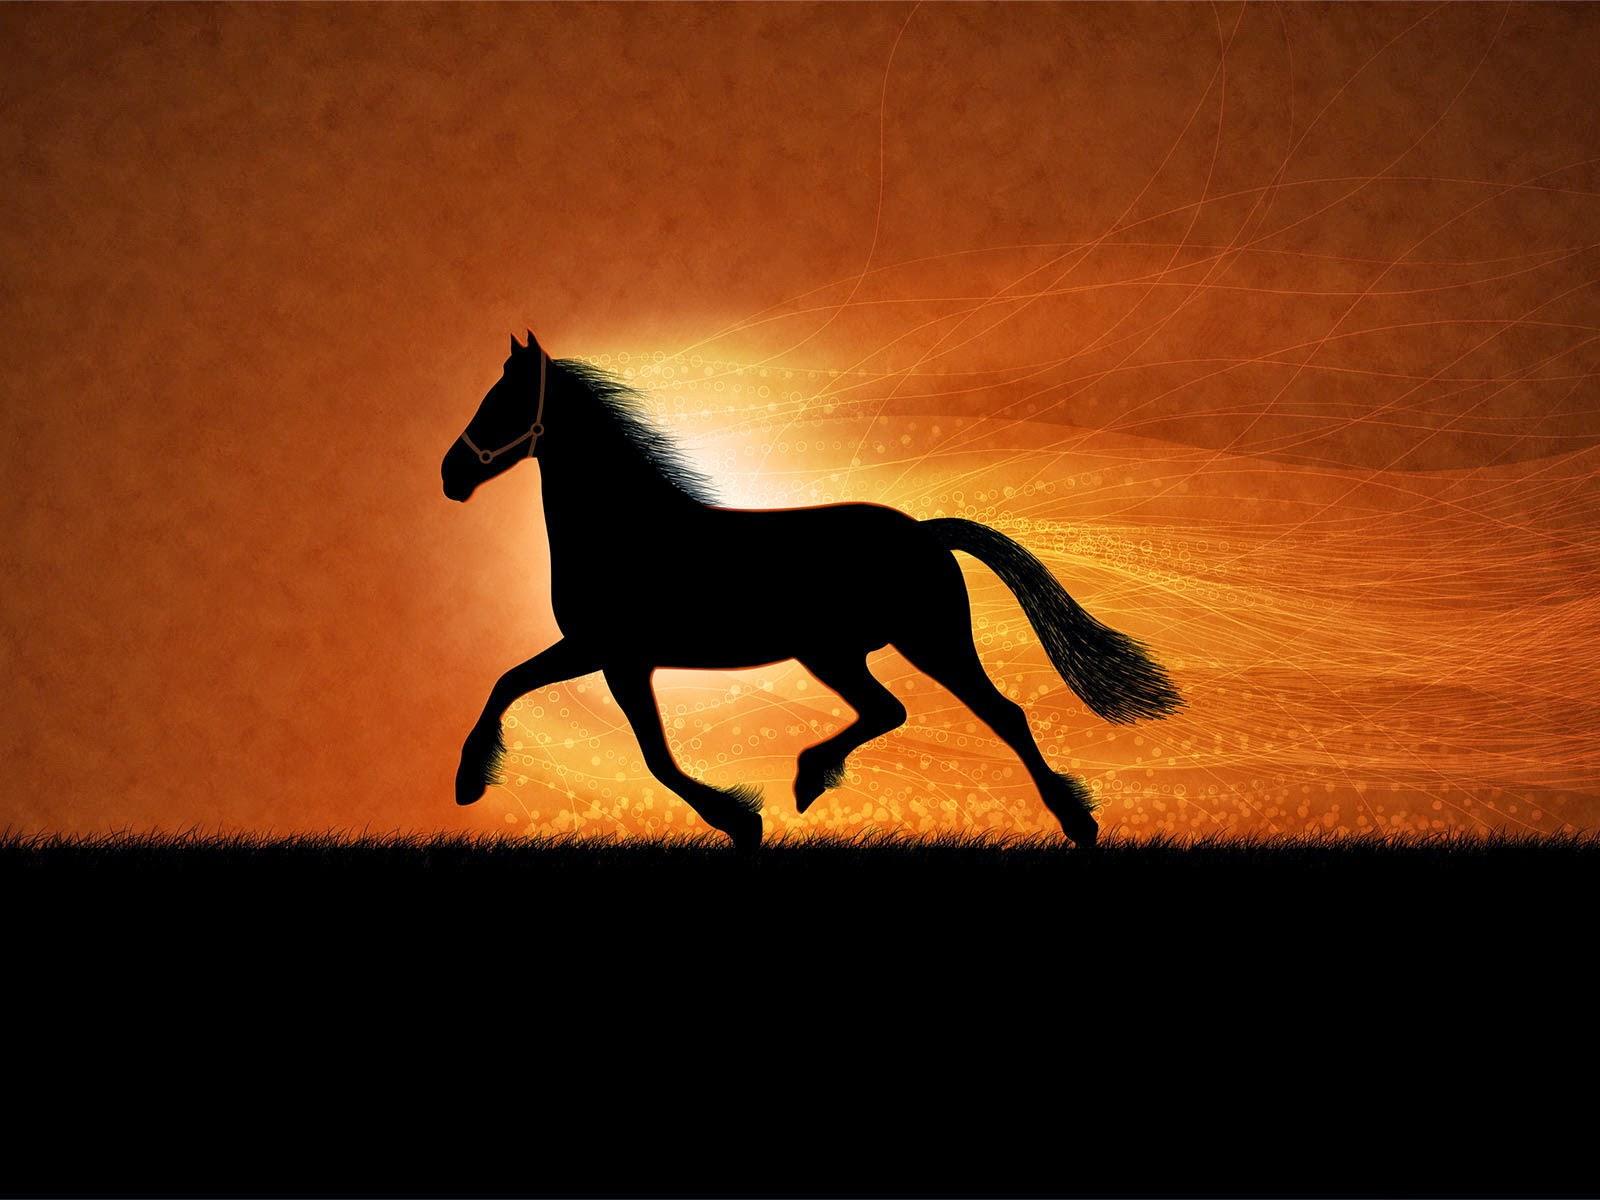 Wonderful   Wallpaper Horse Art - wxp%2B(7)  Perfect Image Reference_809524.jpg